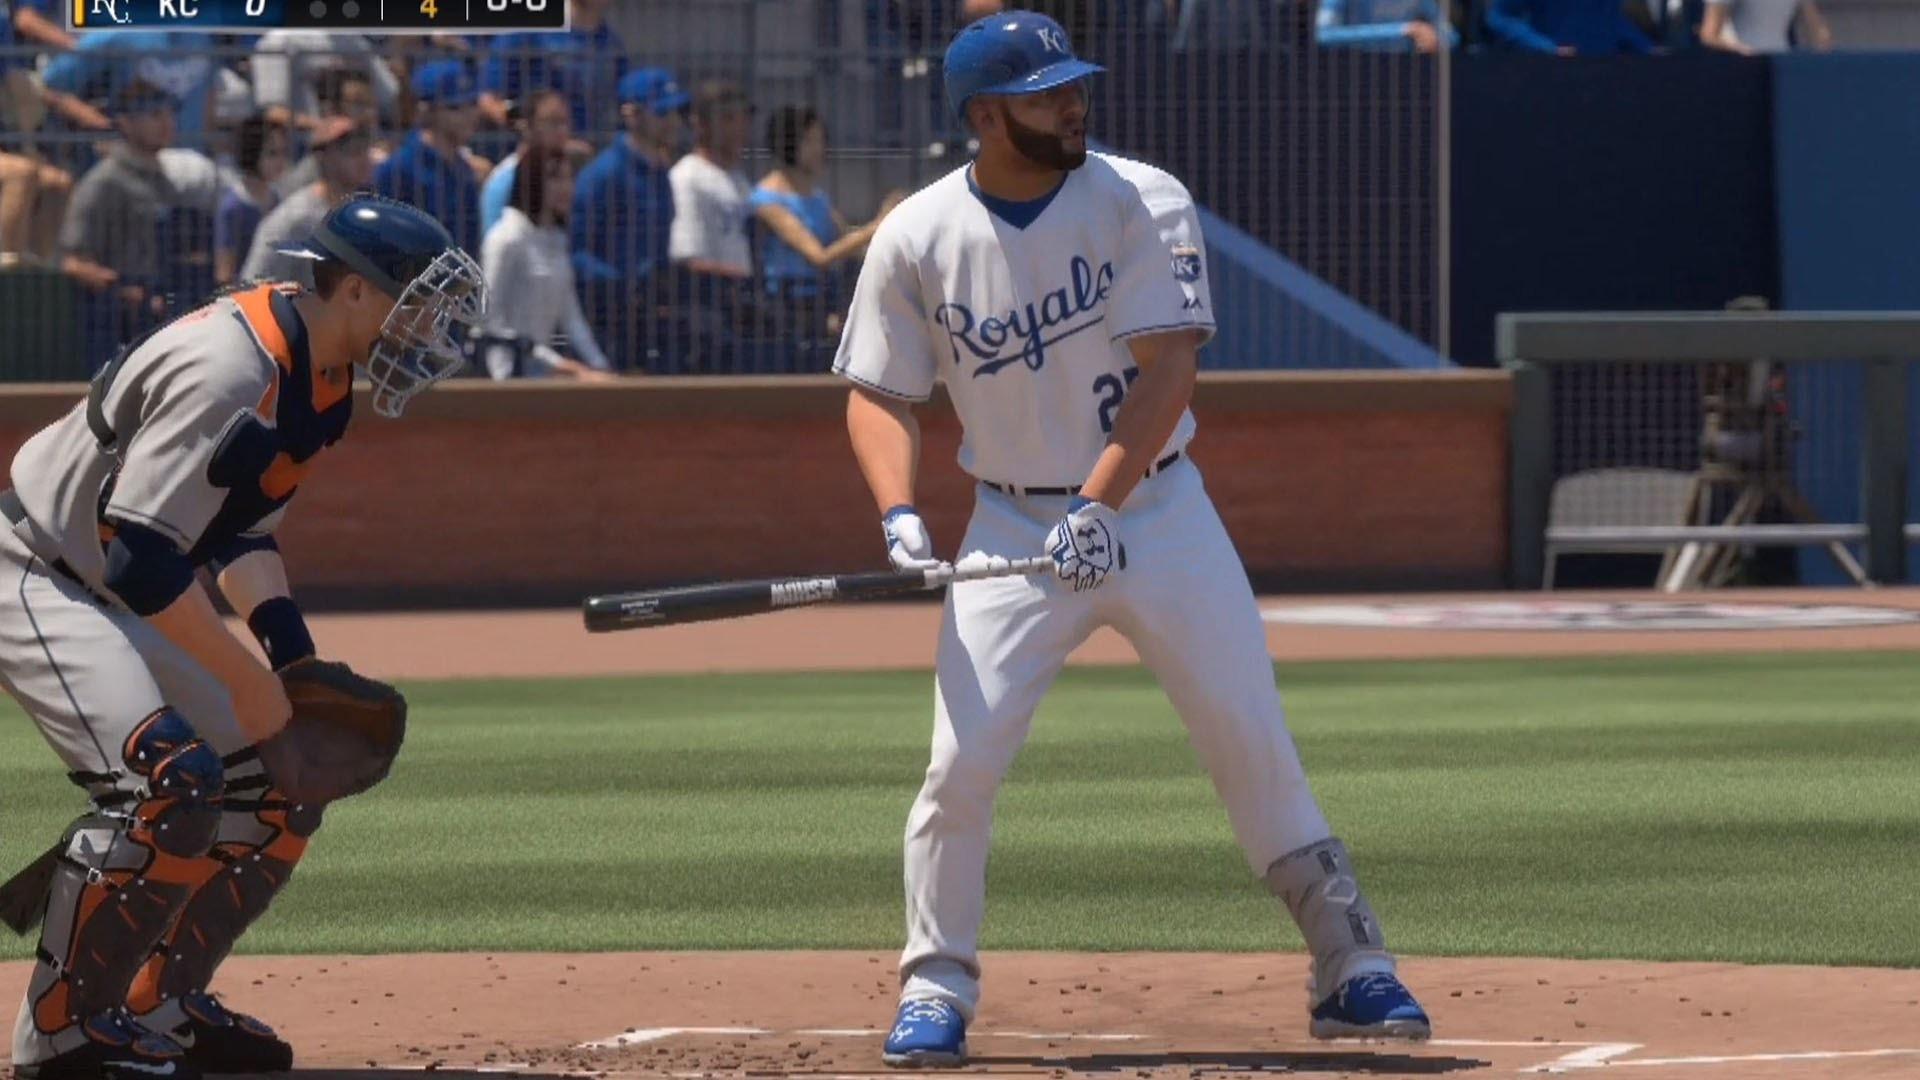 MLB The Show 16 – Houston Astros vs Kansas City Royals   Gameplay (PS4 HD)  [1080p60FPS] – YouTube